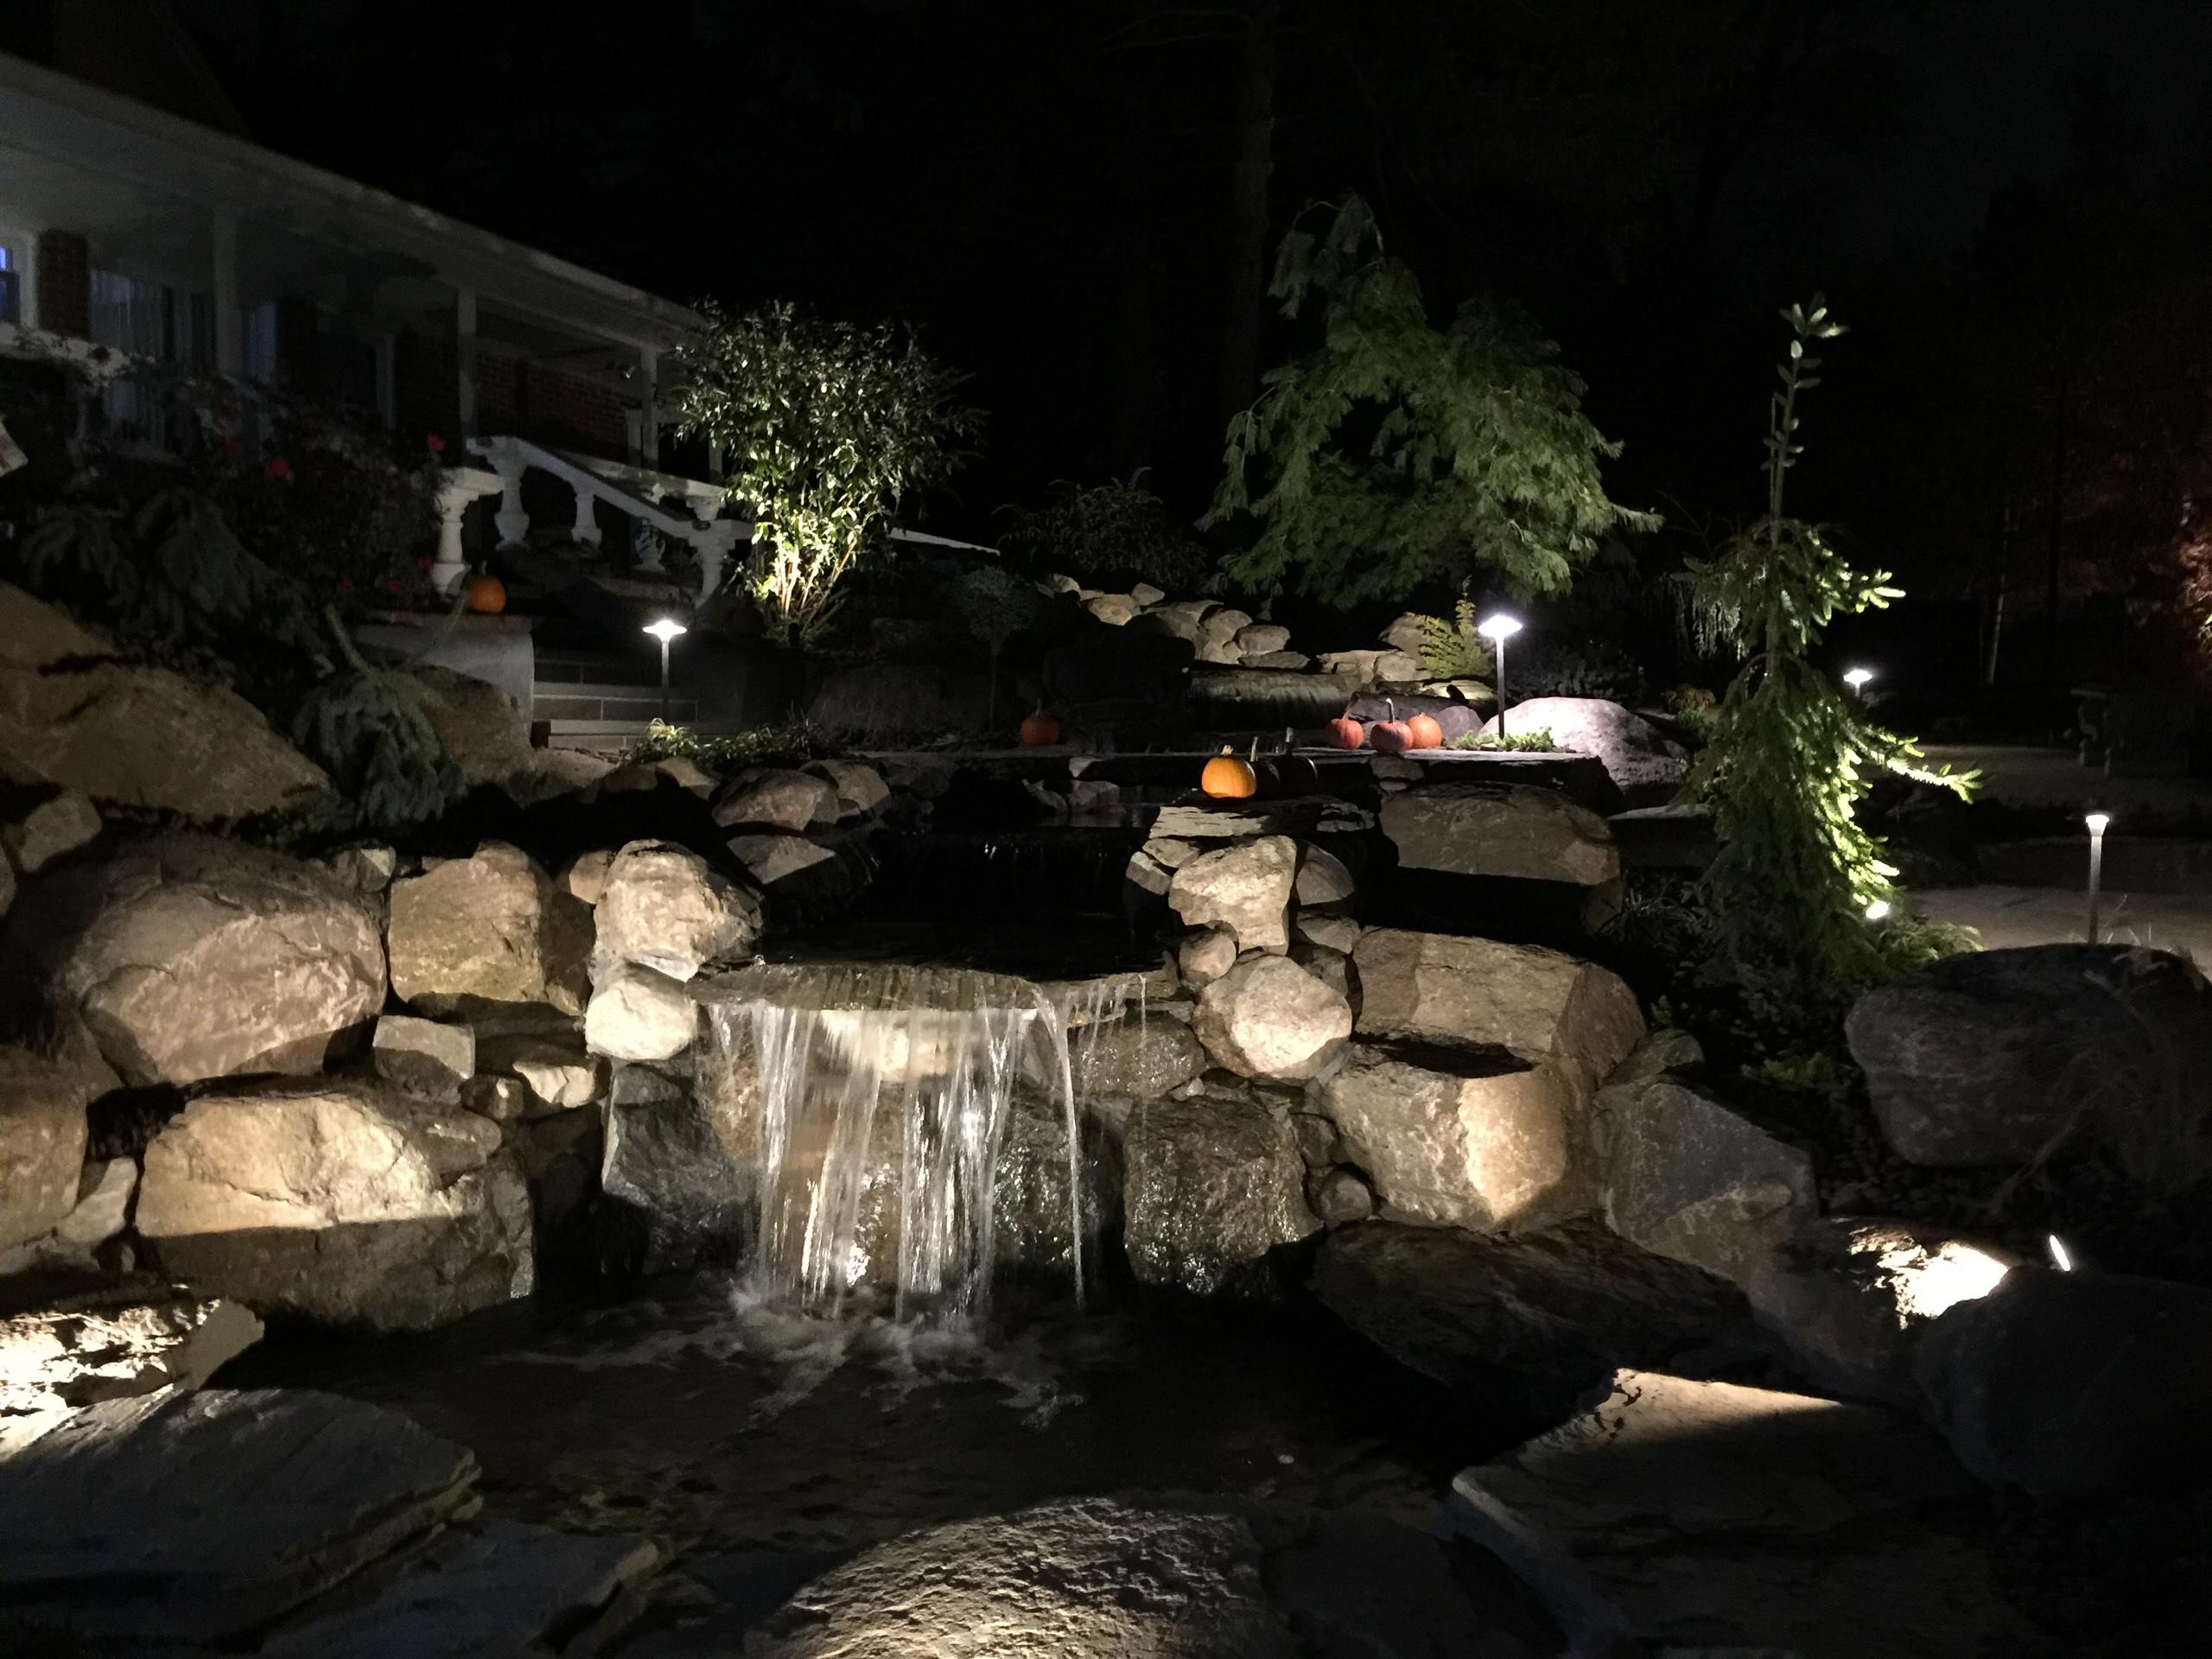 waterfall stream with stone bridge and natural bluestone walkwayway and steps